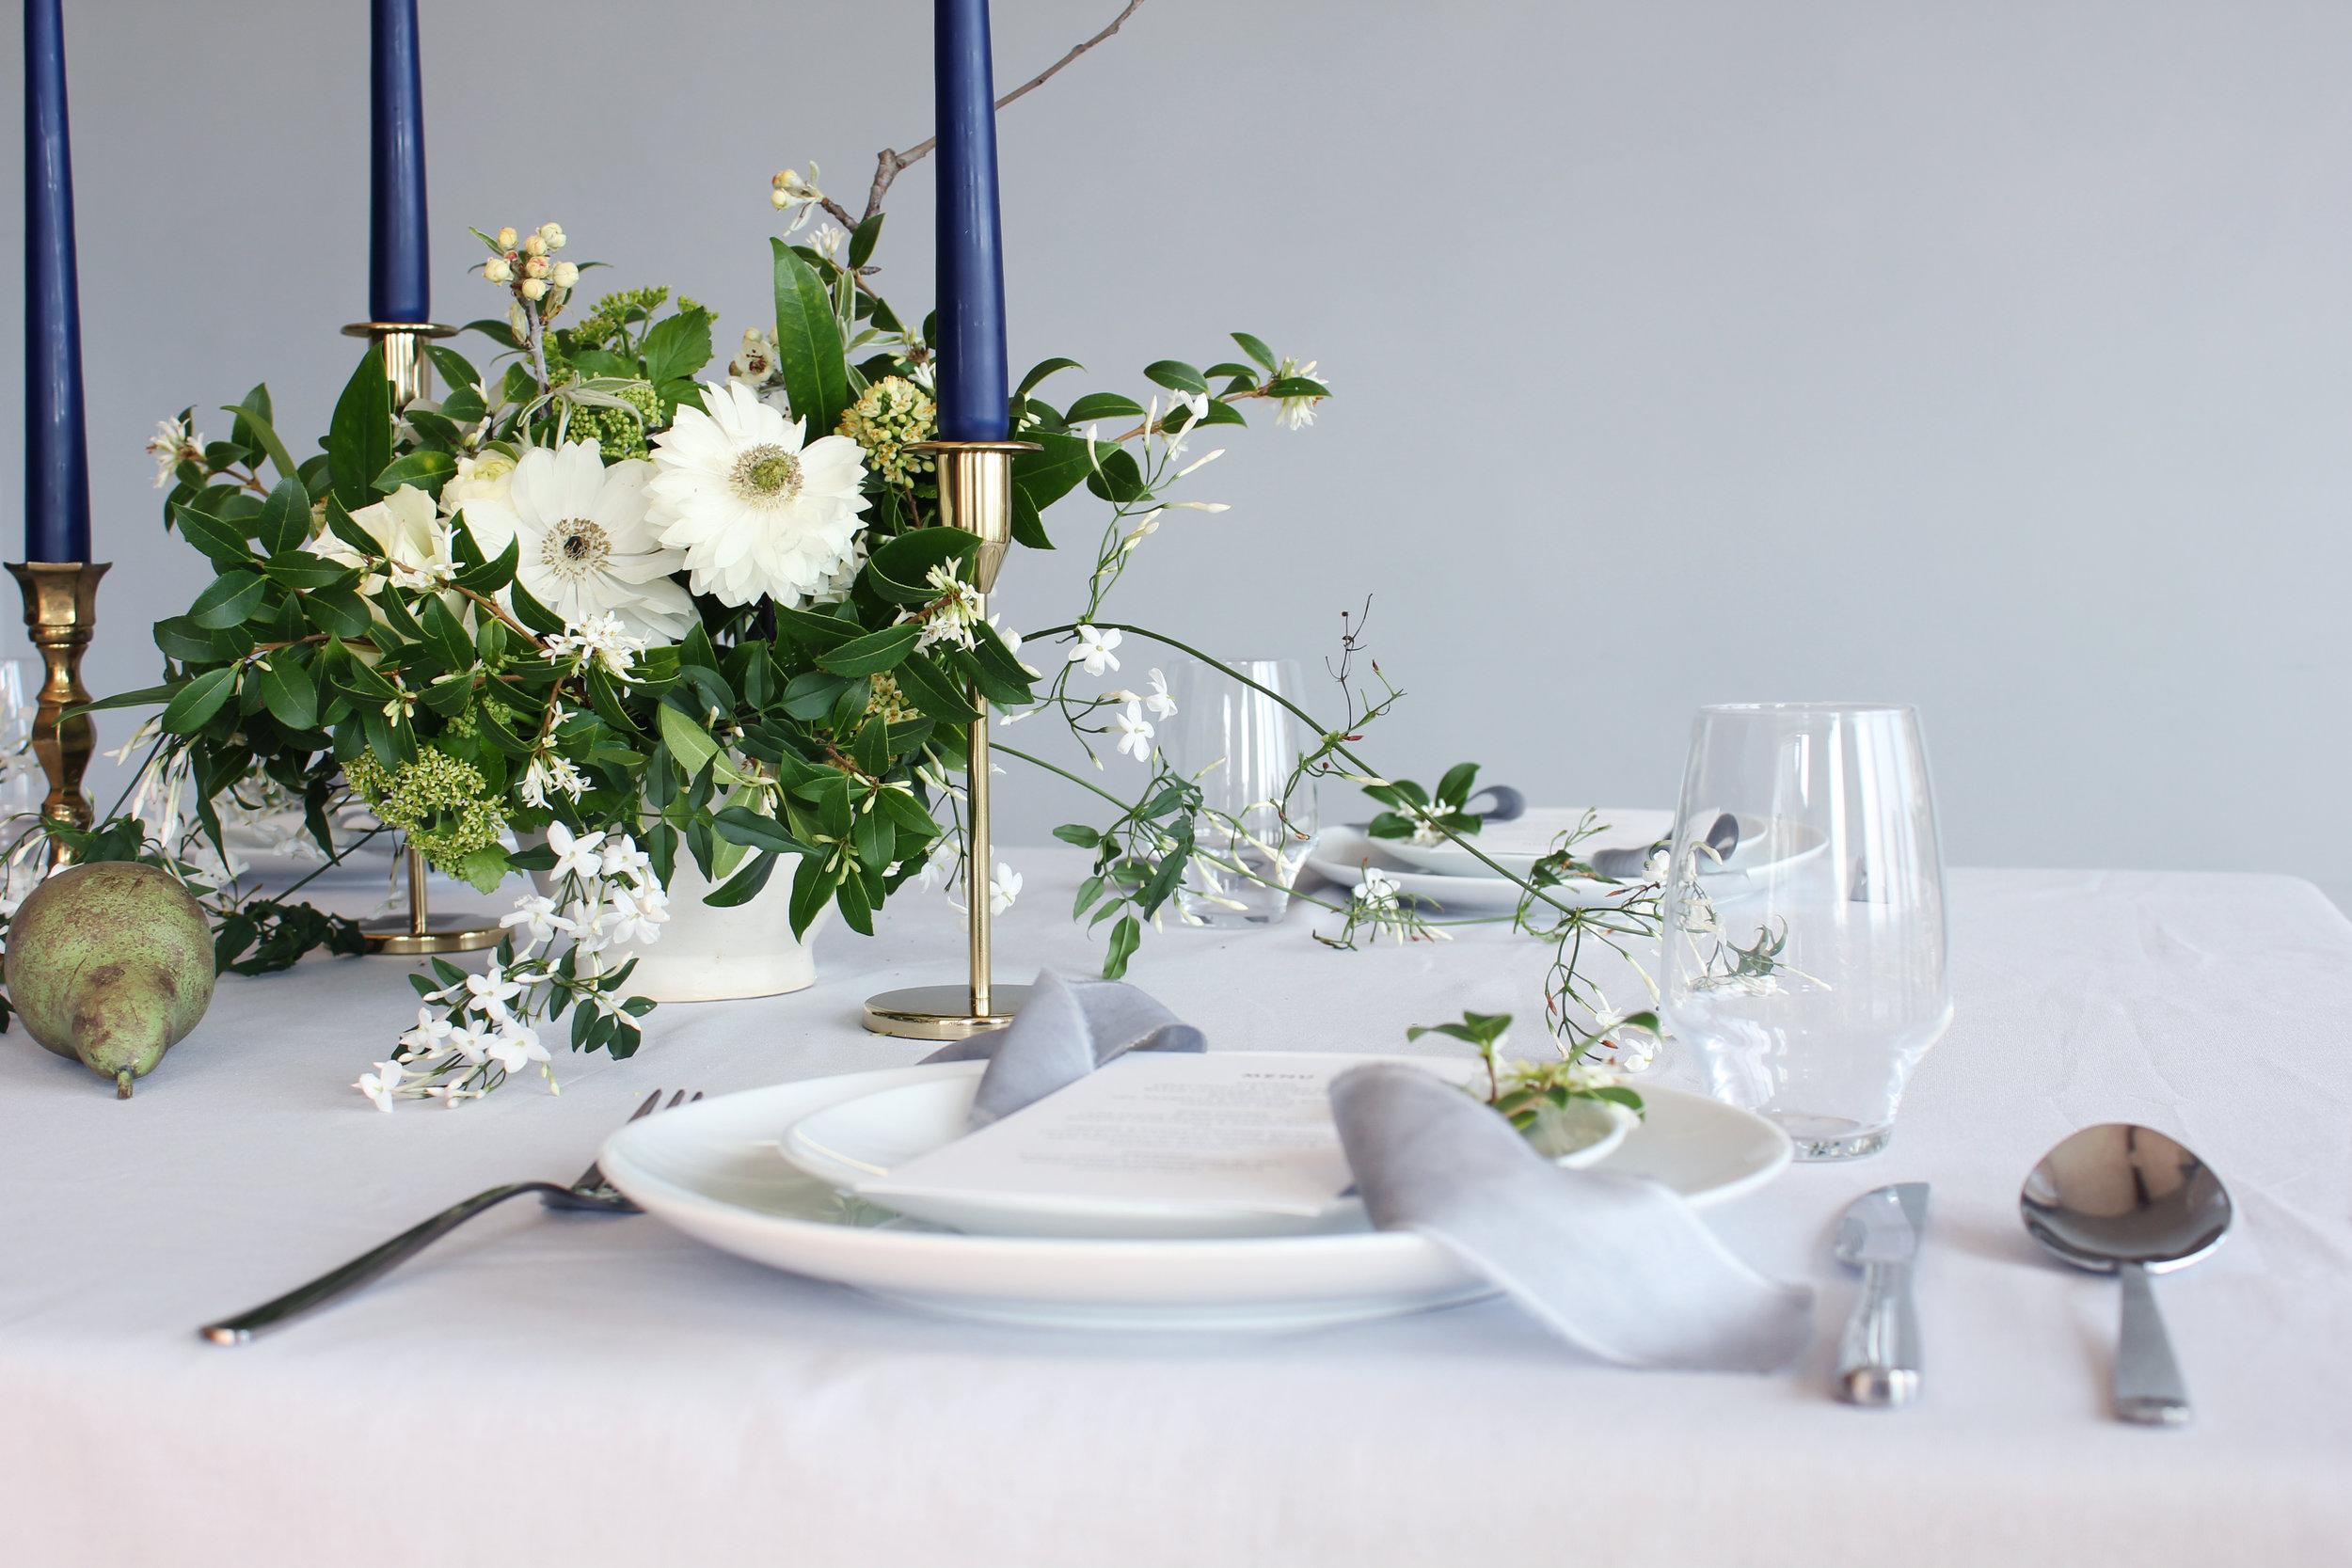 Callie-Pettigrew-Dusky-Blue-Wedding-5.jpg